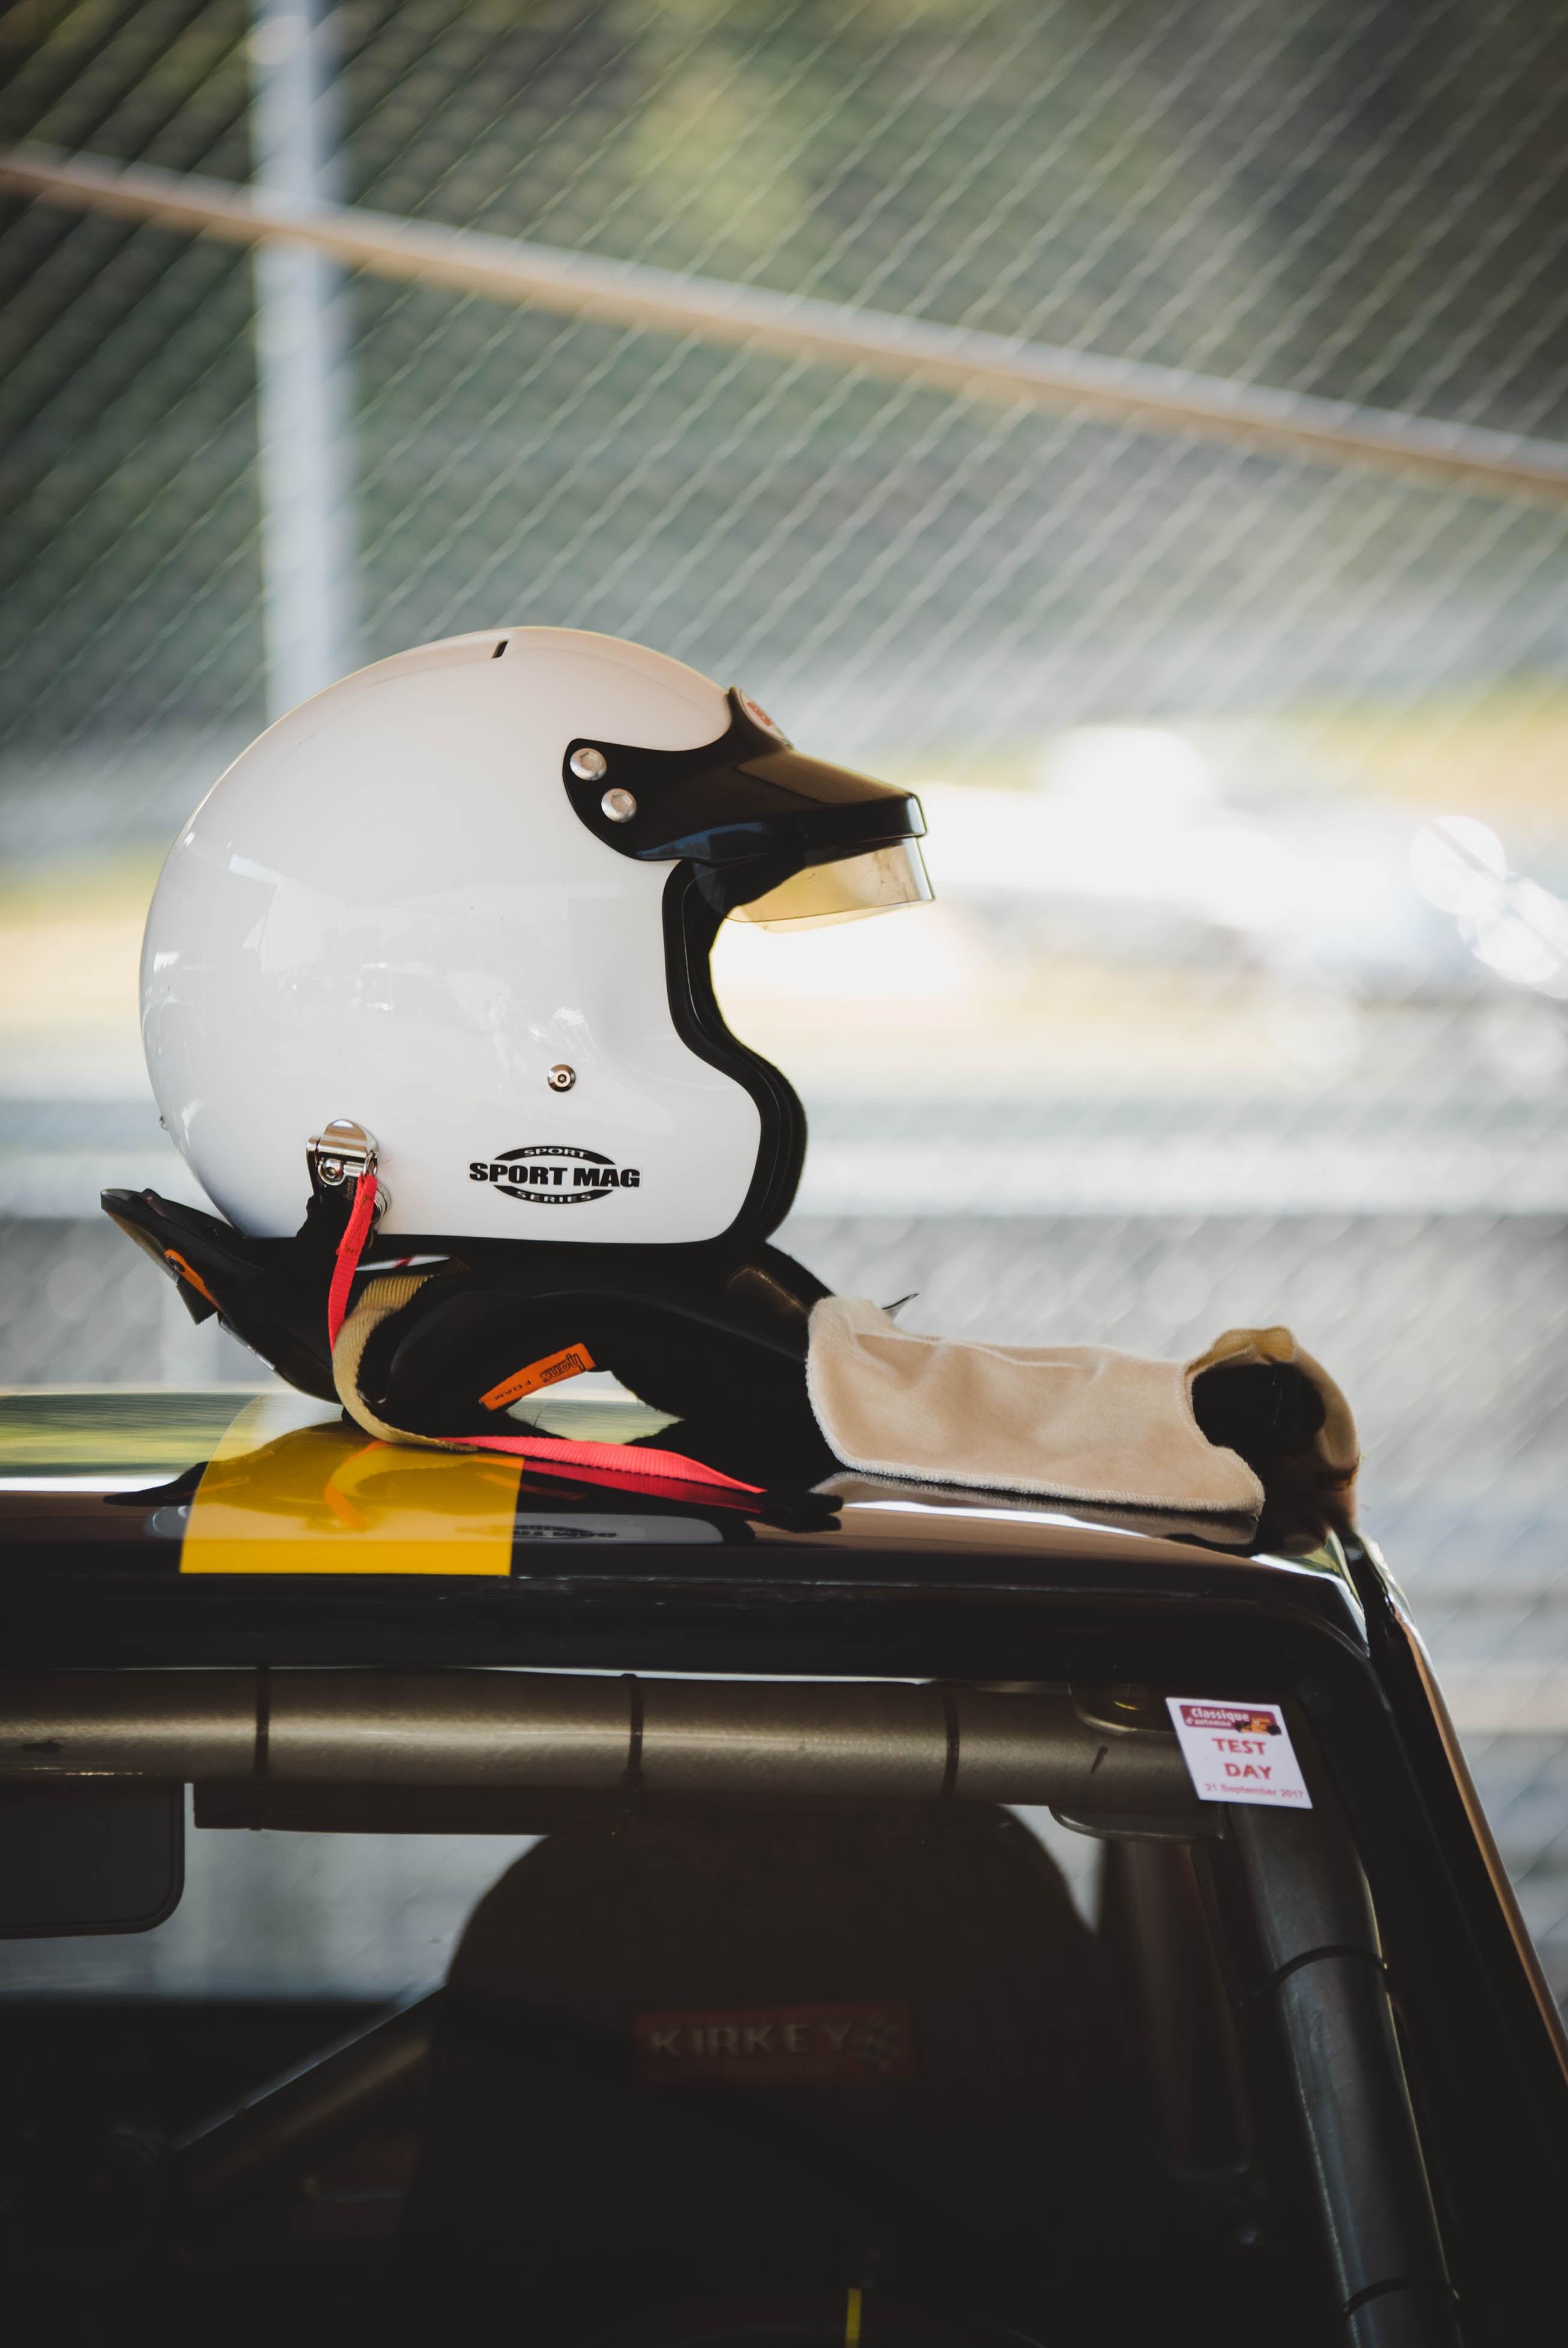 white half-face helmet on vehicle rooftop